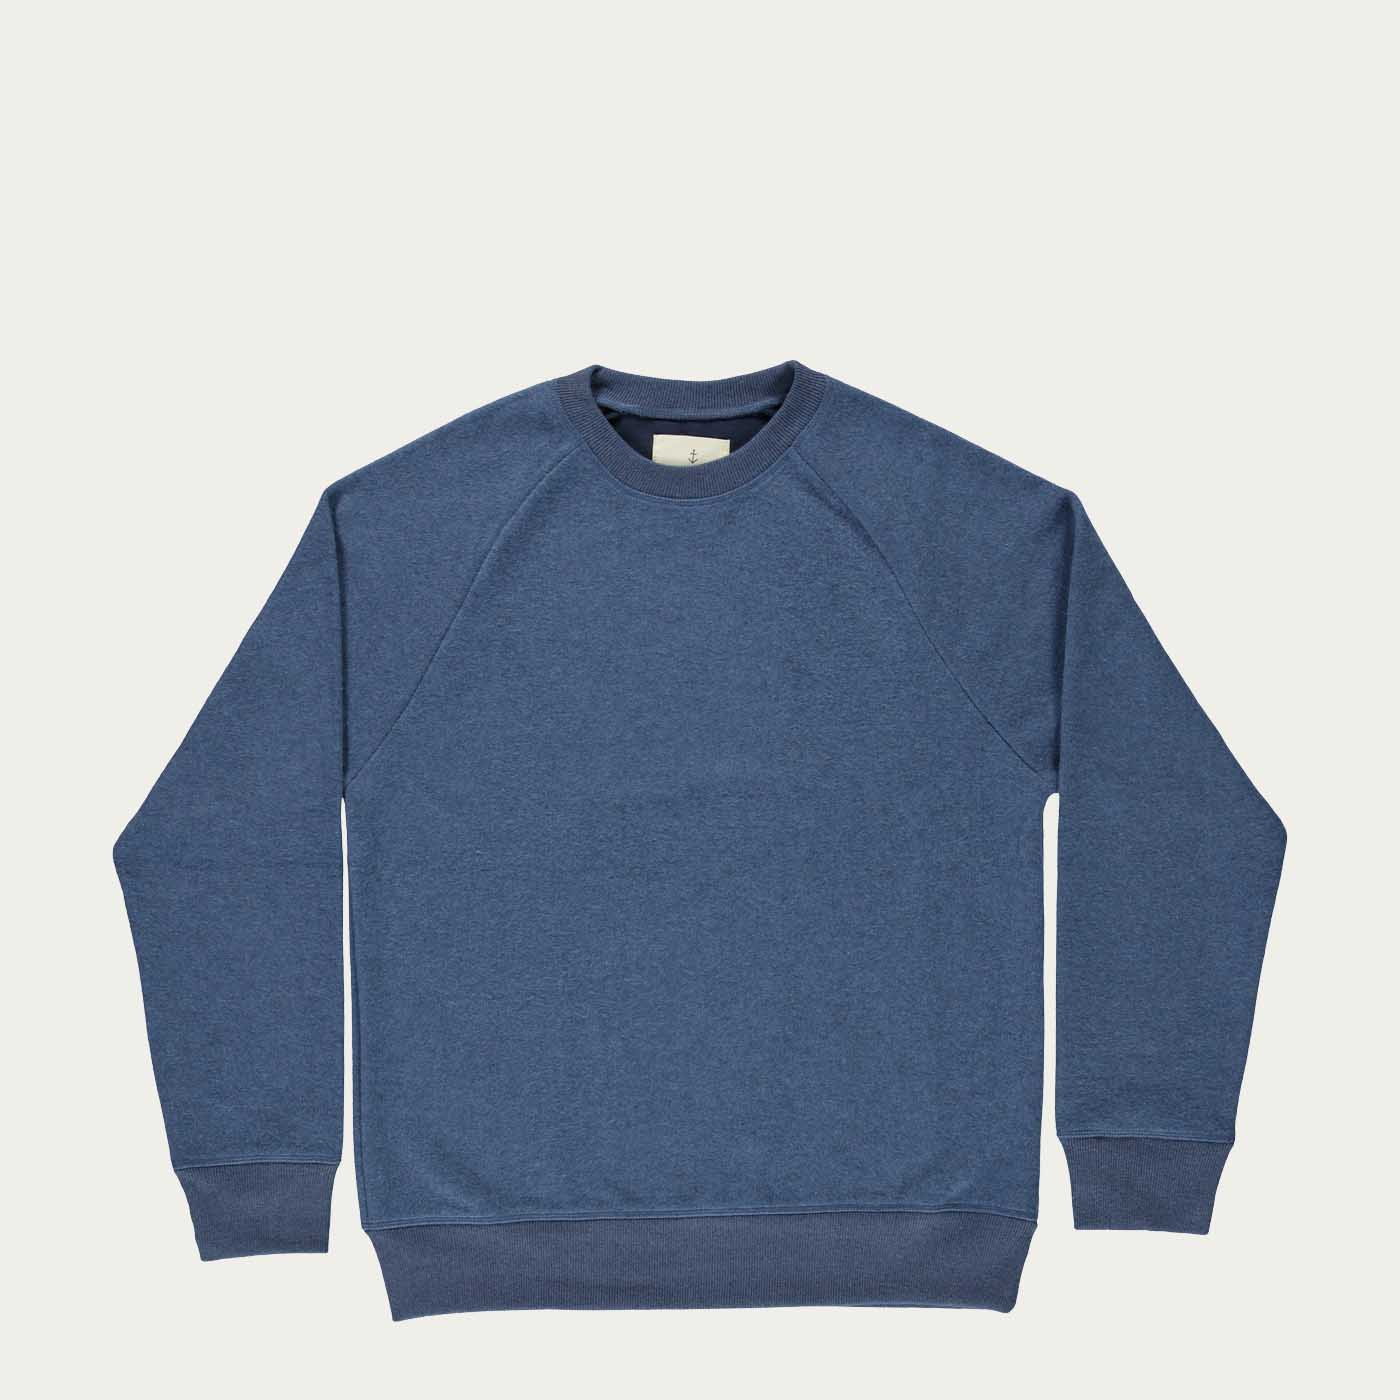 Soft Blue Felpa Cunha Sweatshirt | Bombinate